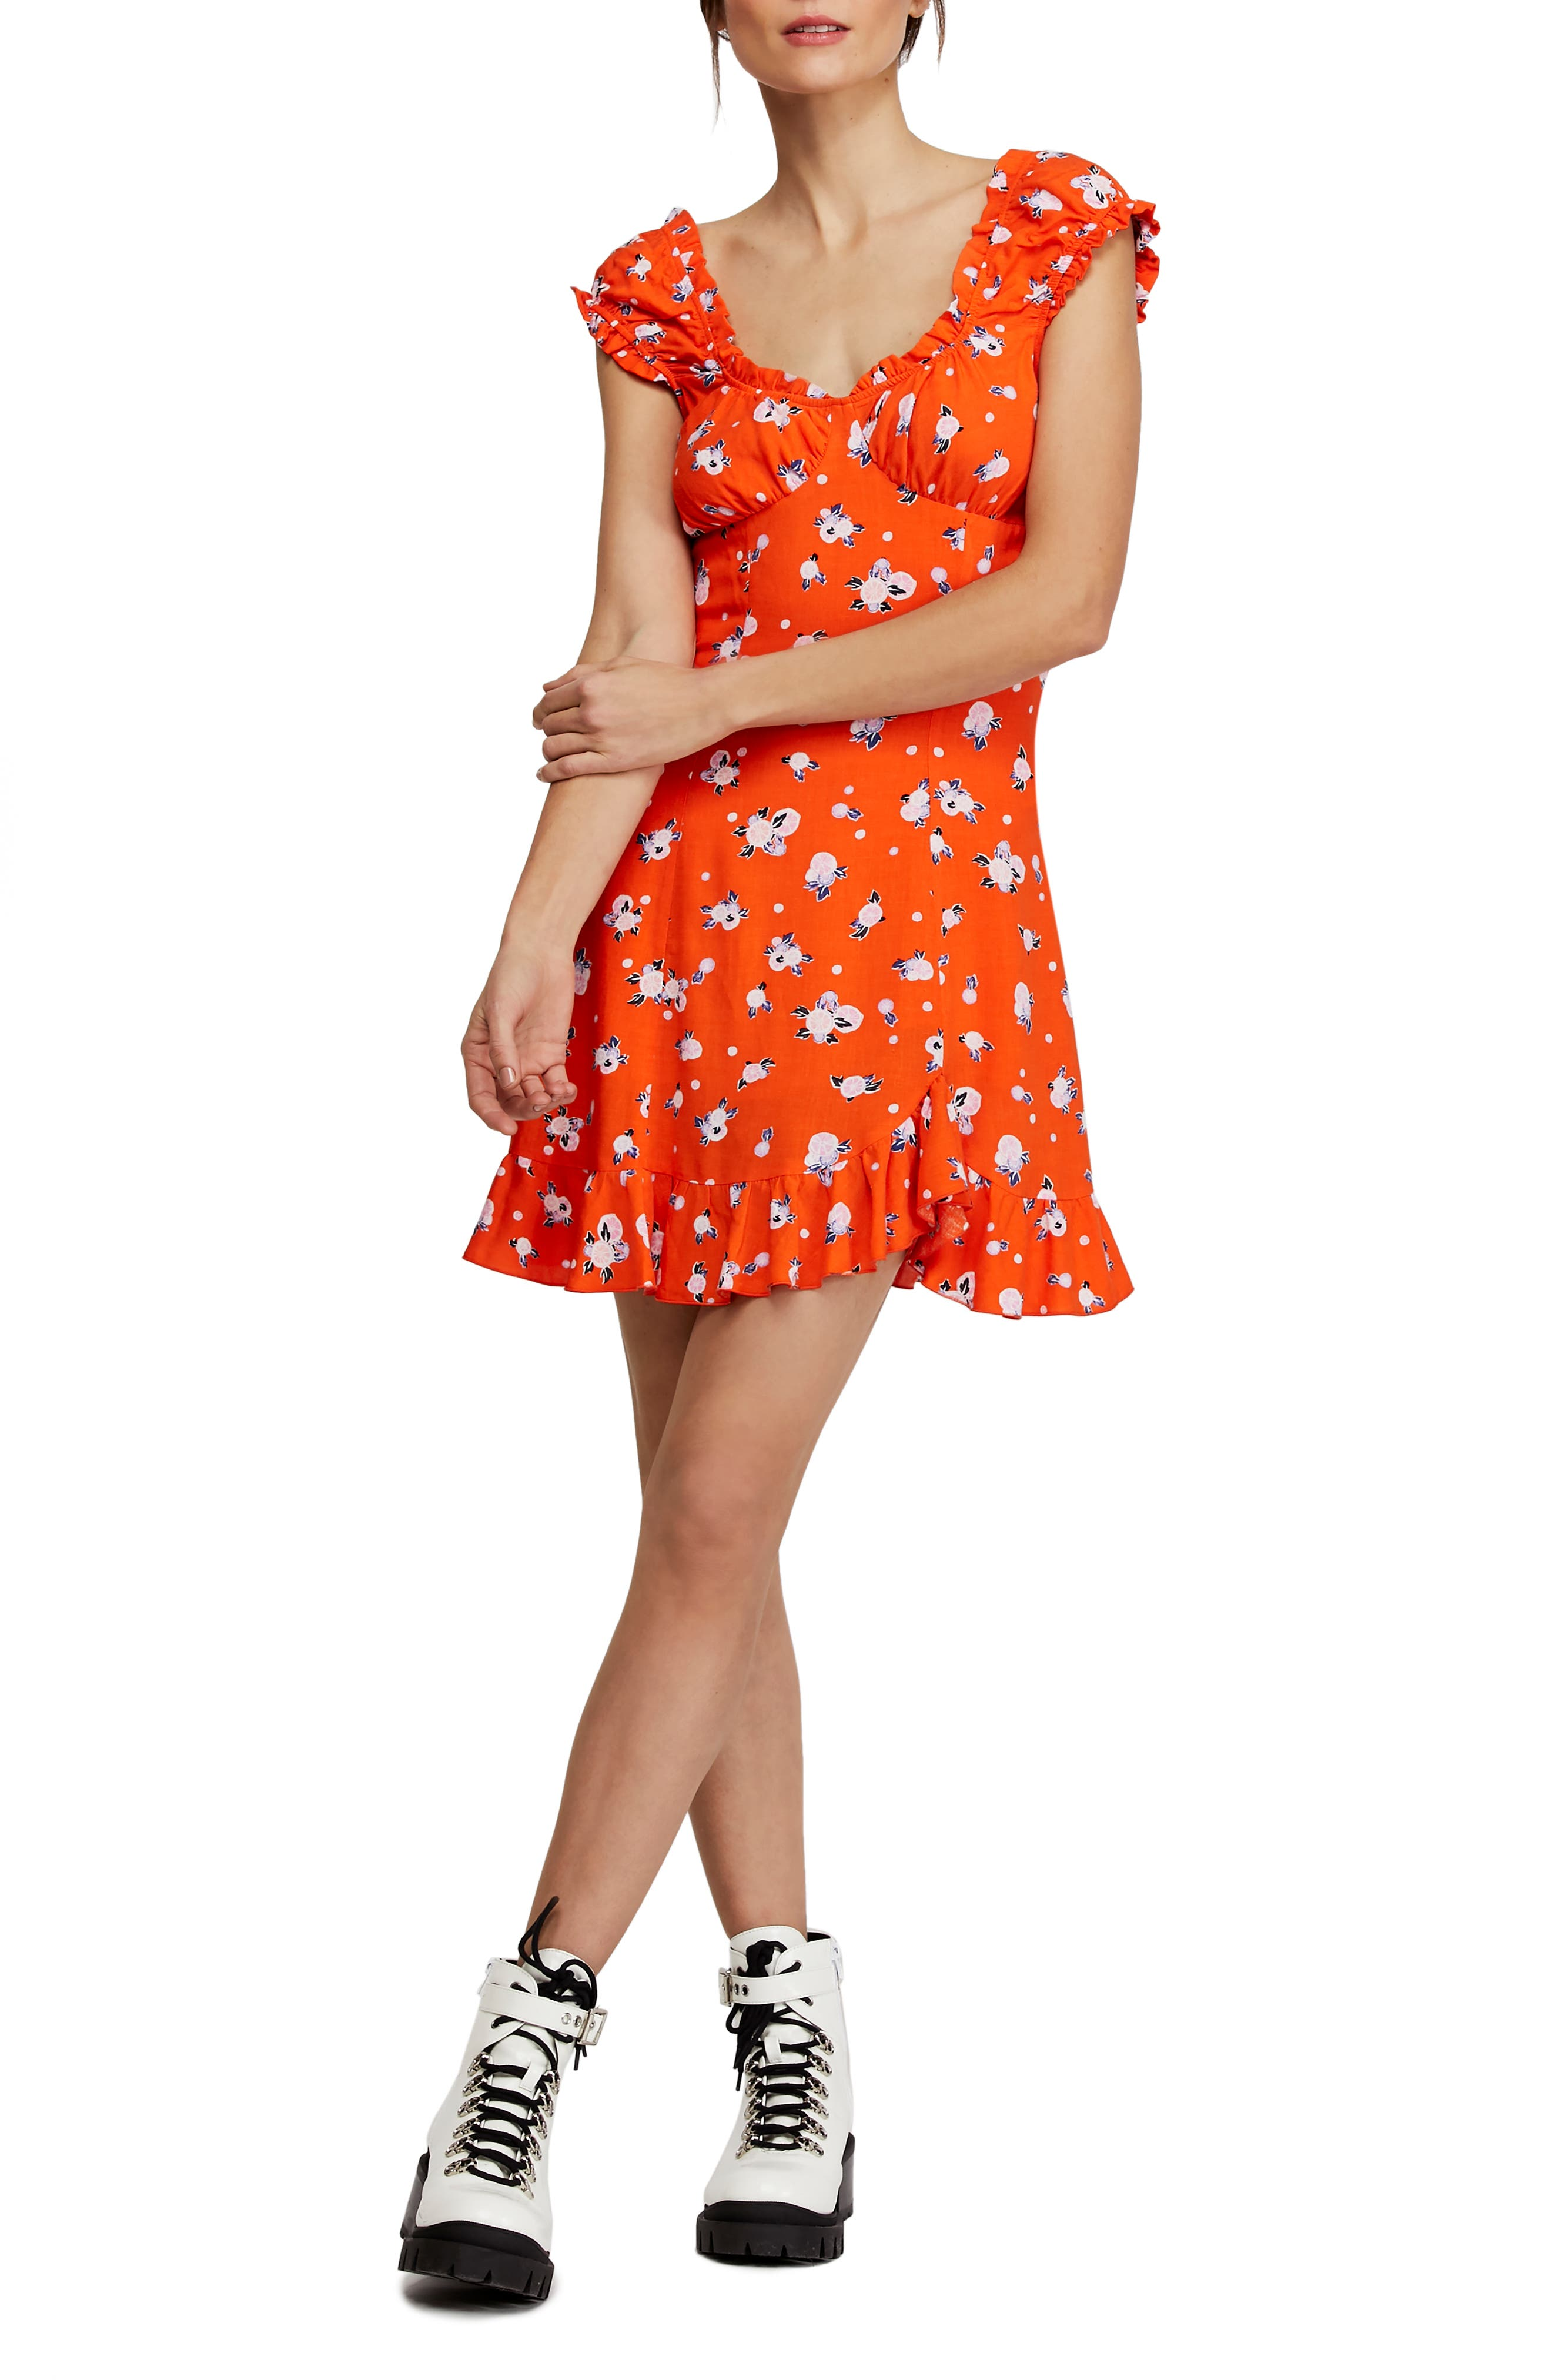 Free People Like A Lady Print Minidress, Orange